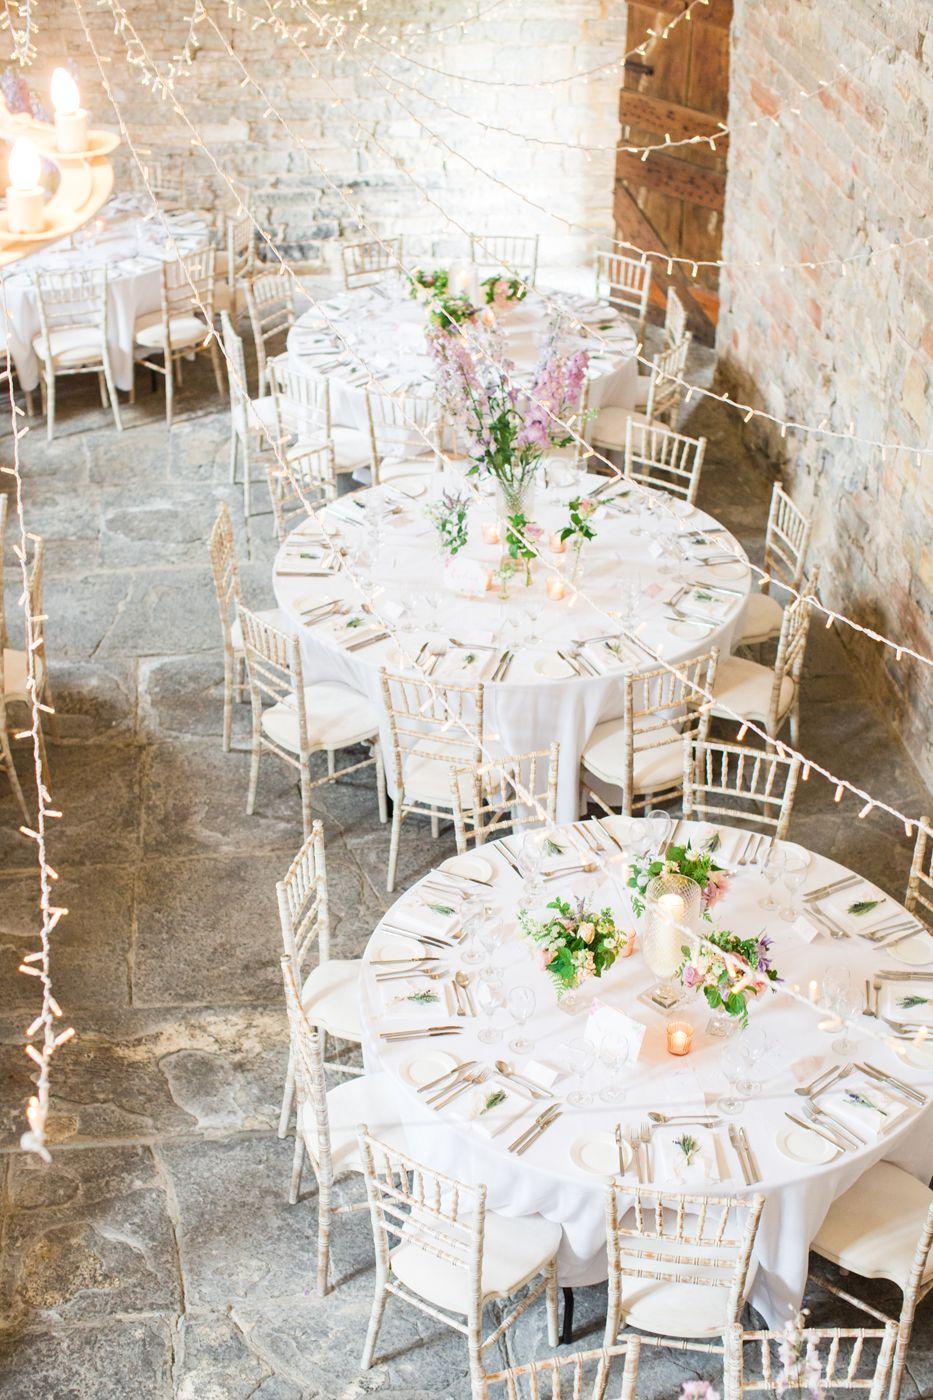 English Countryside Wedding Inspired by Gardening | Pinterest ...